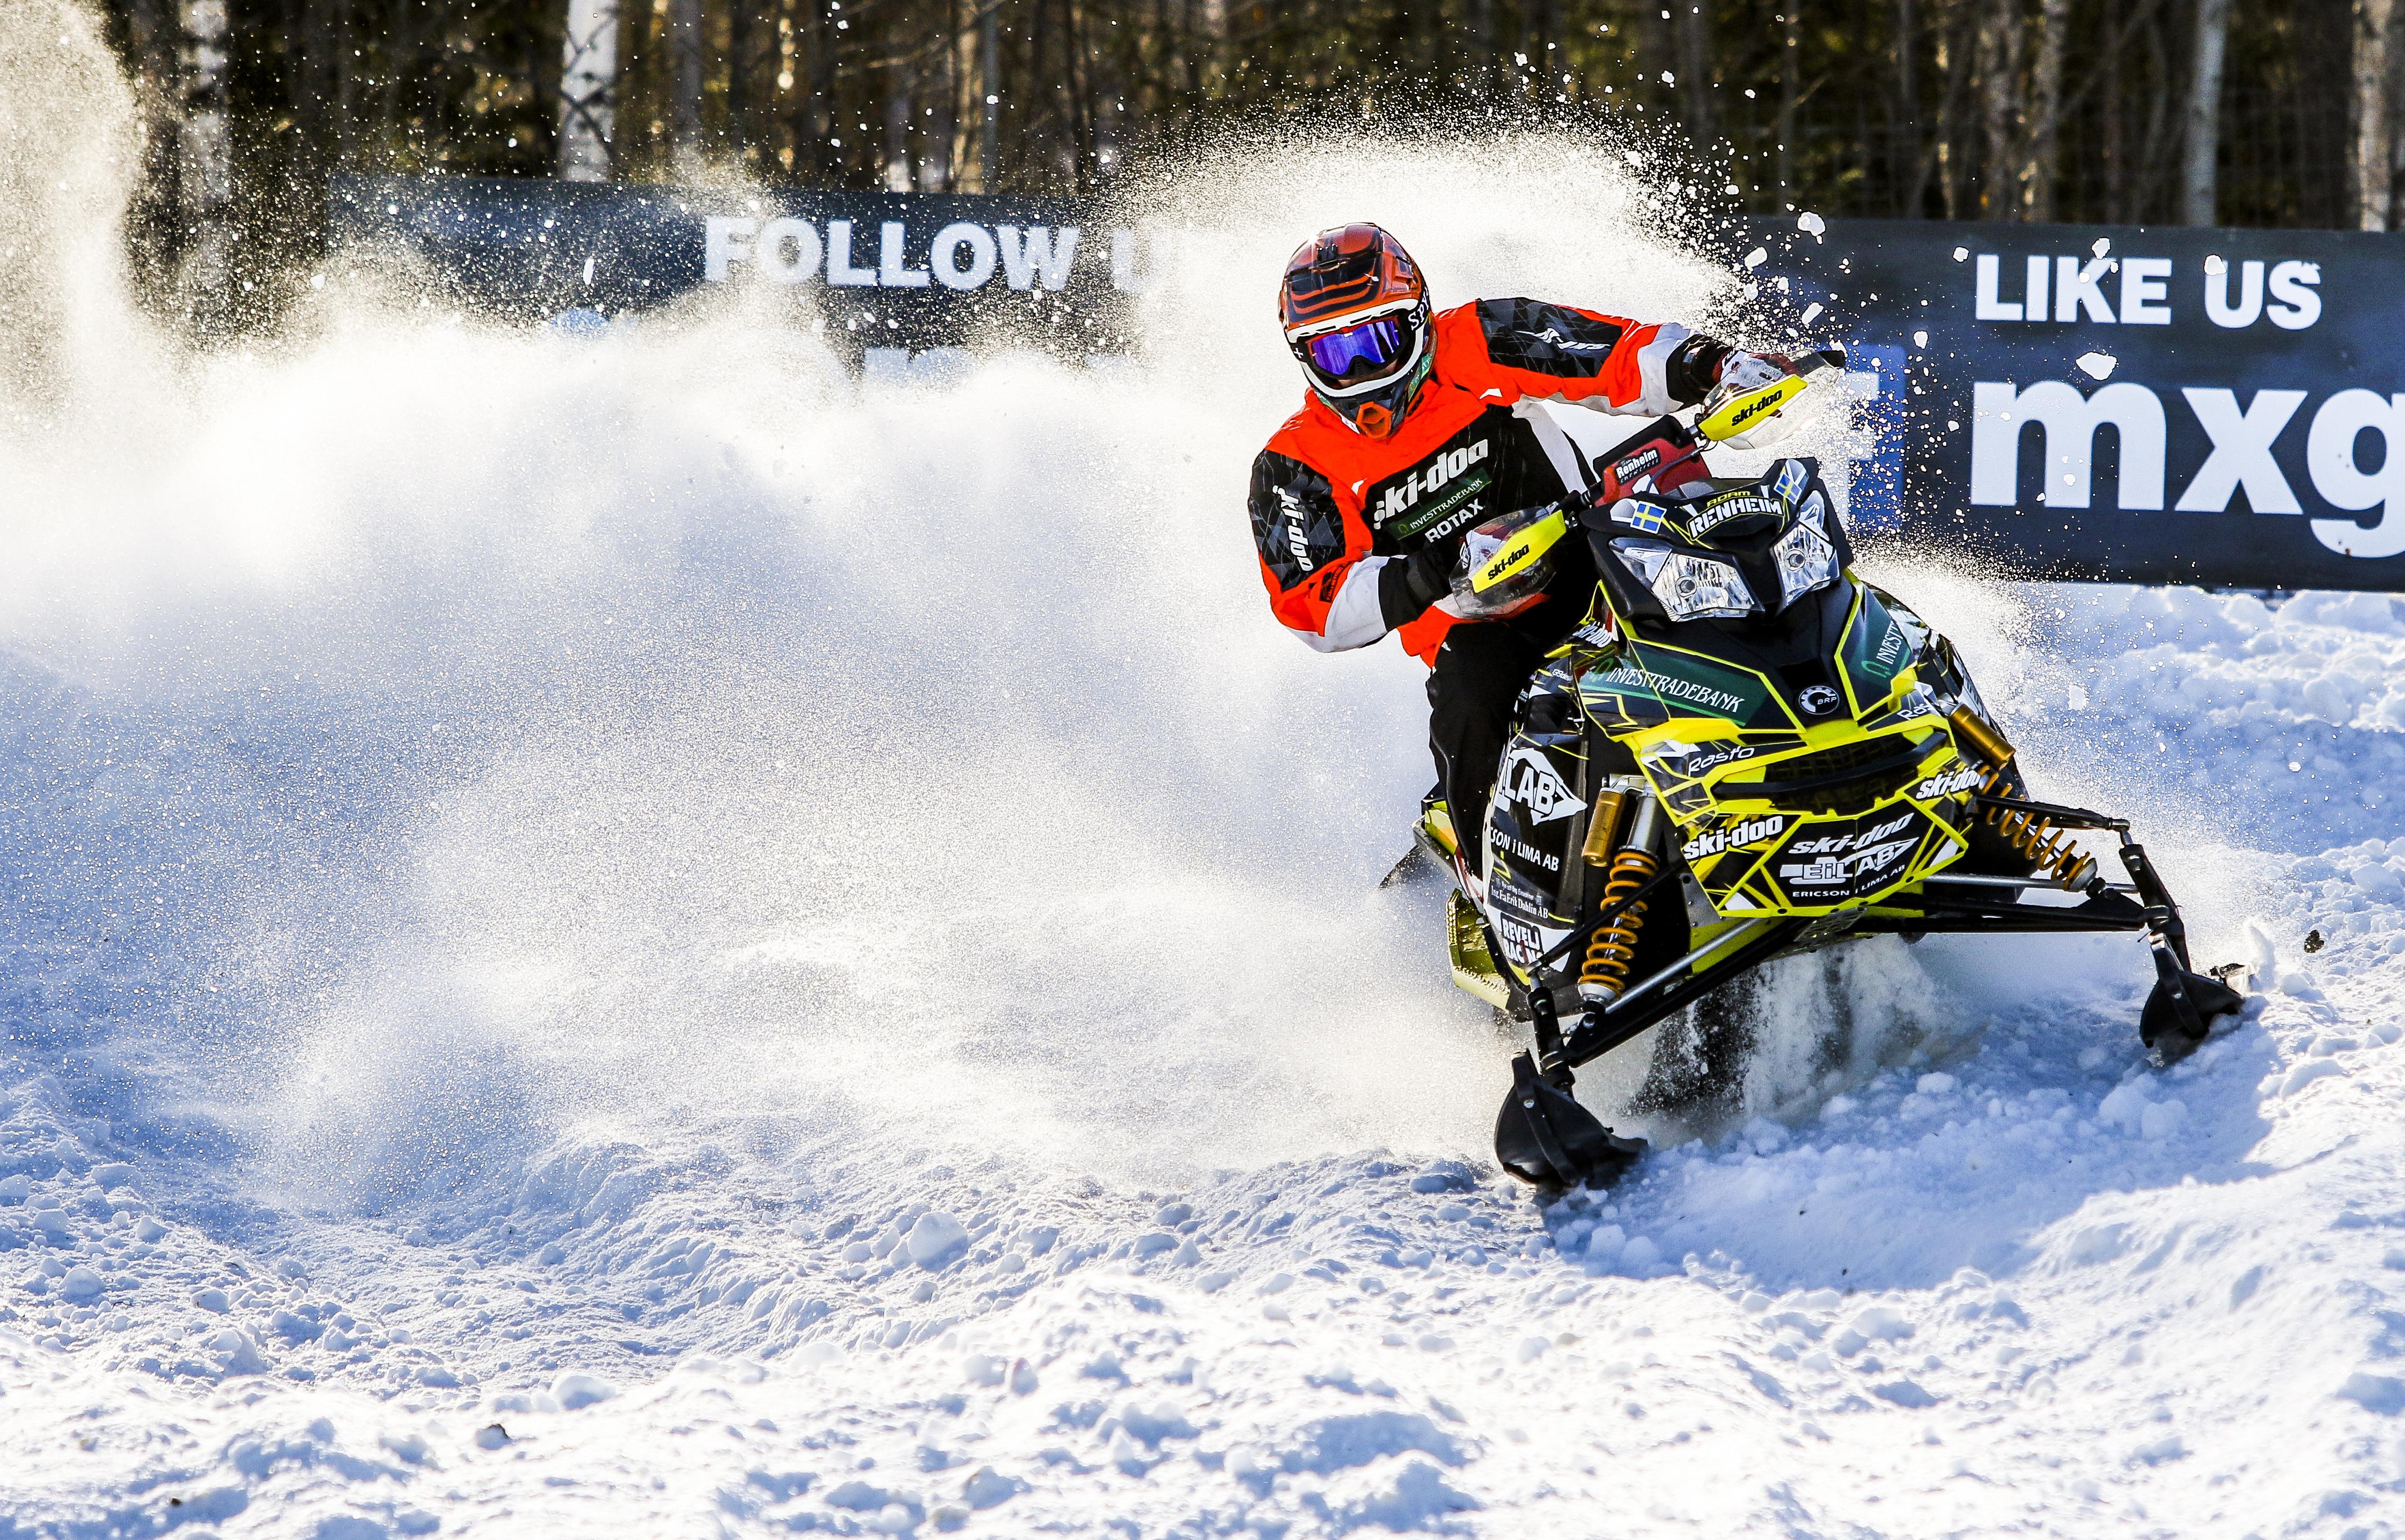 FIM Women's Snowcross World Cup